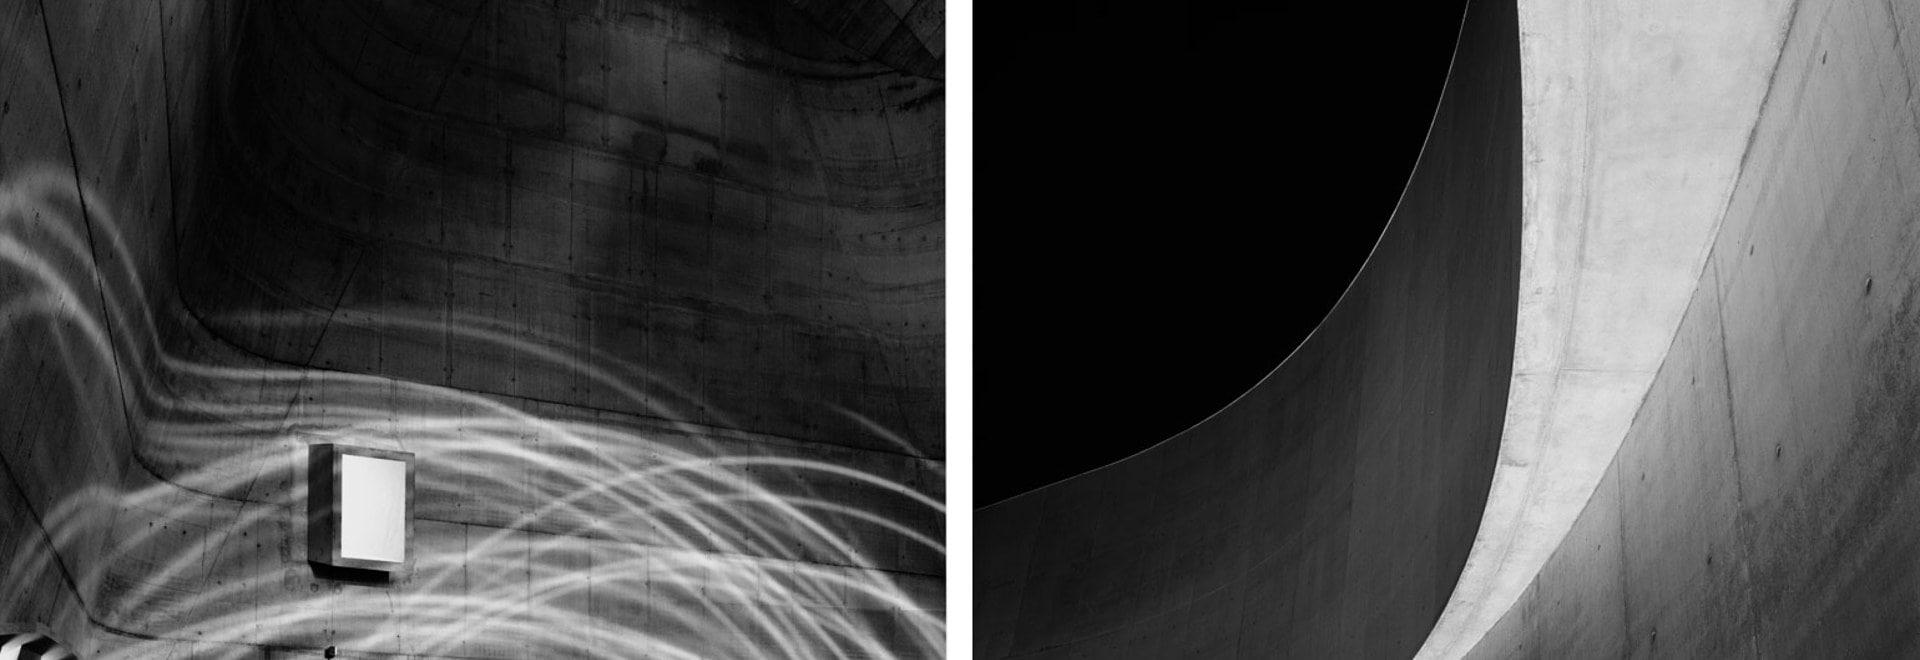 Left: Firminy Church by Le Corbusier (2007). Photography: Hélène Binet, courtesy ammann gallery Right: MAXXI Diptychon by Zaha Hadid (2009). Photography: Hélène Binet, courtesy ammann gallery